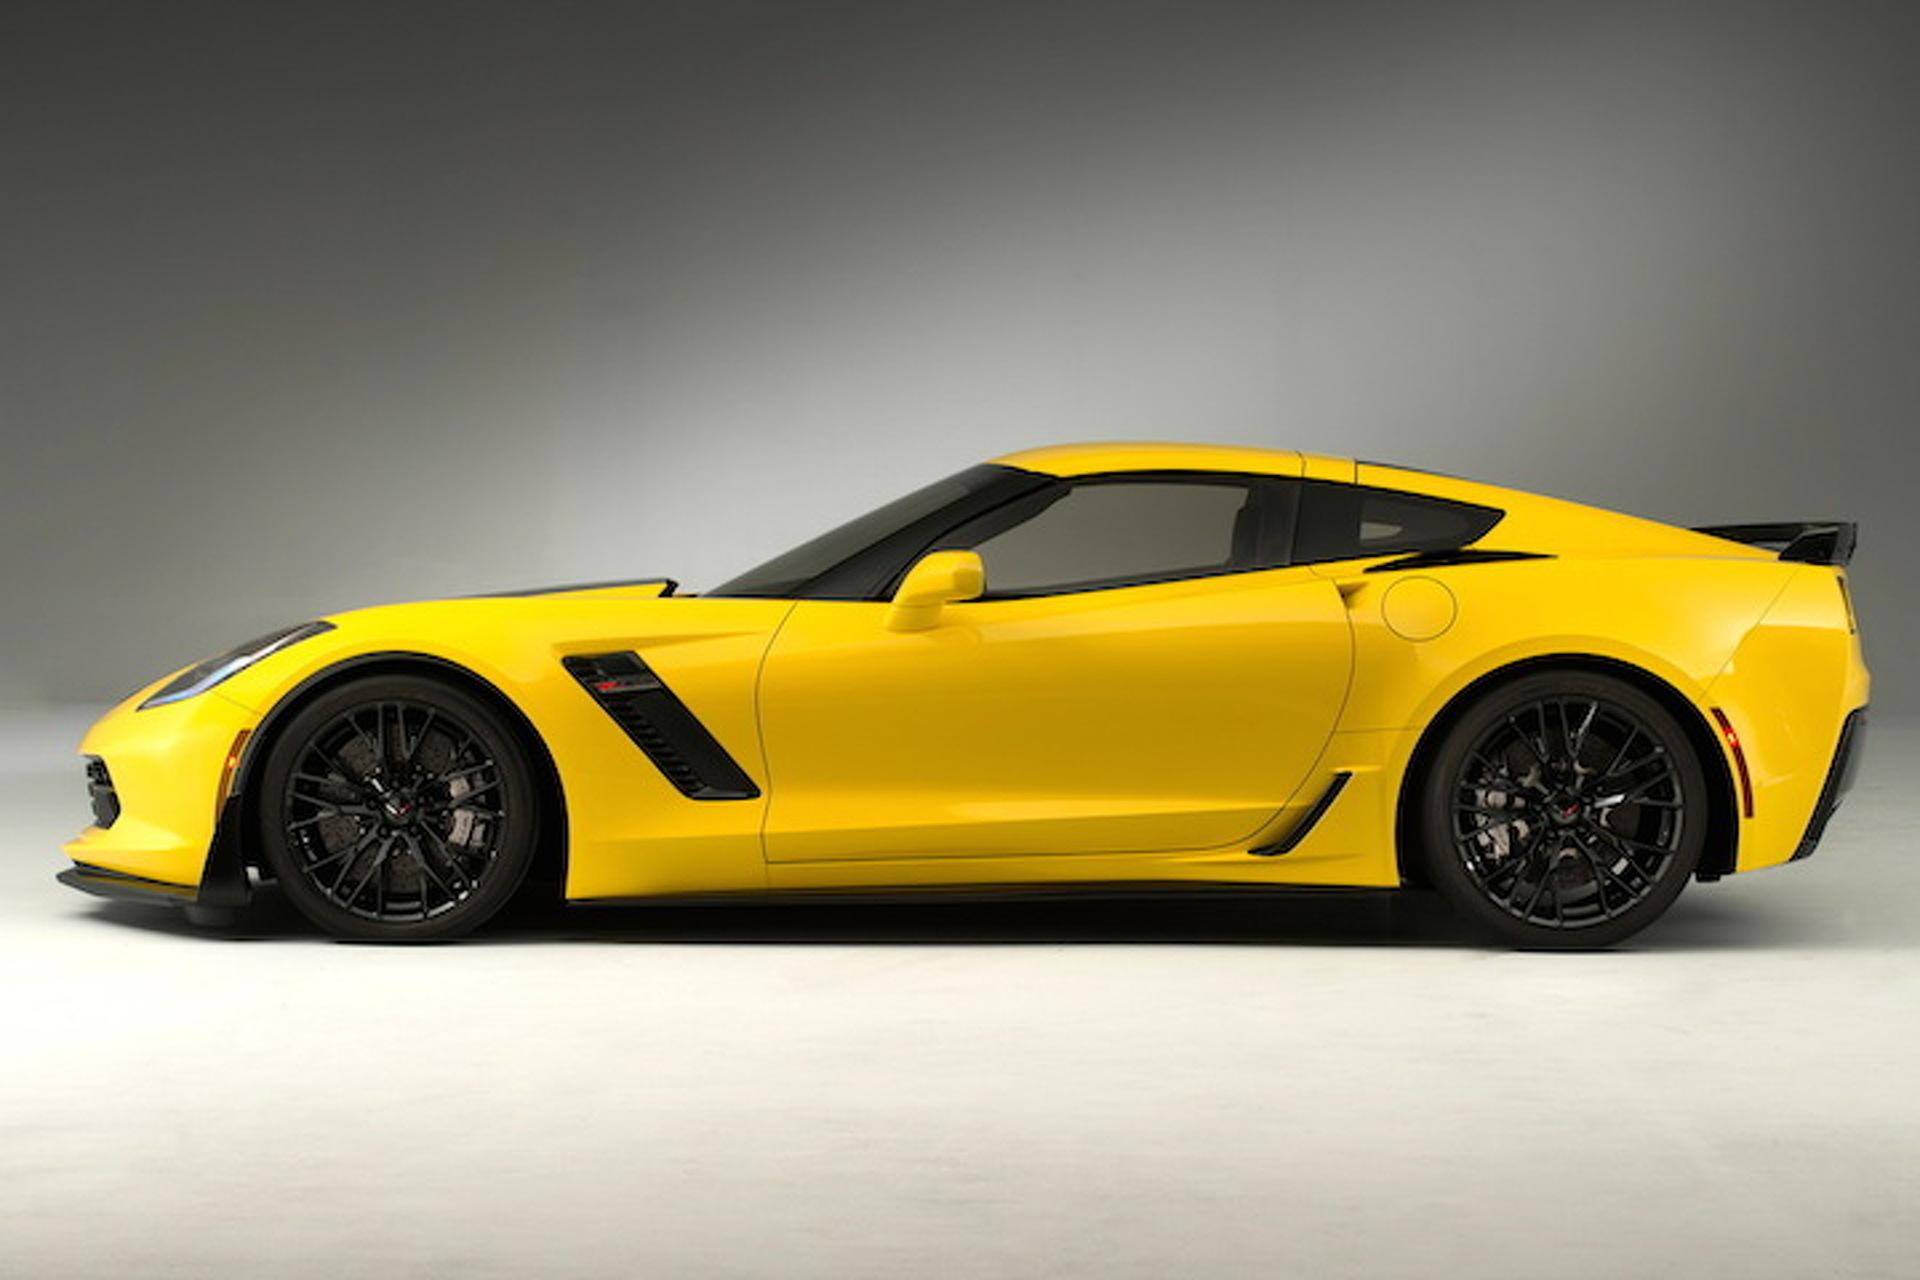 Chevrolet To Introduce New Corvette Variant in New York